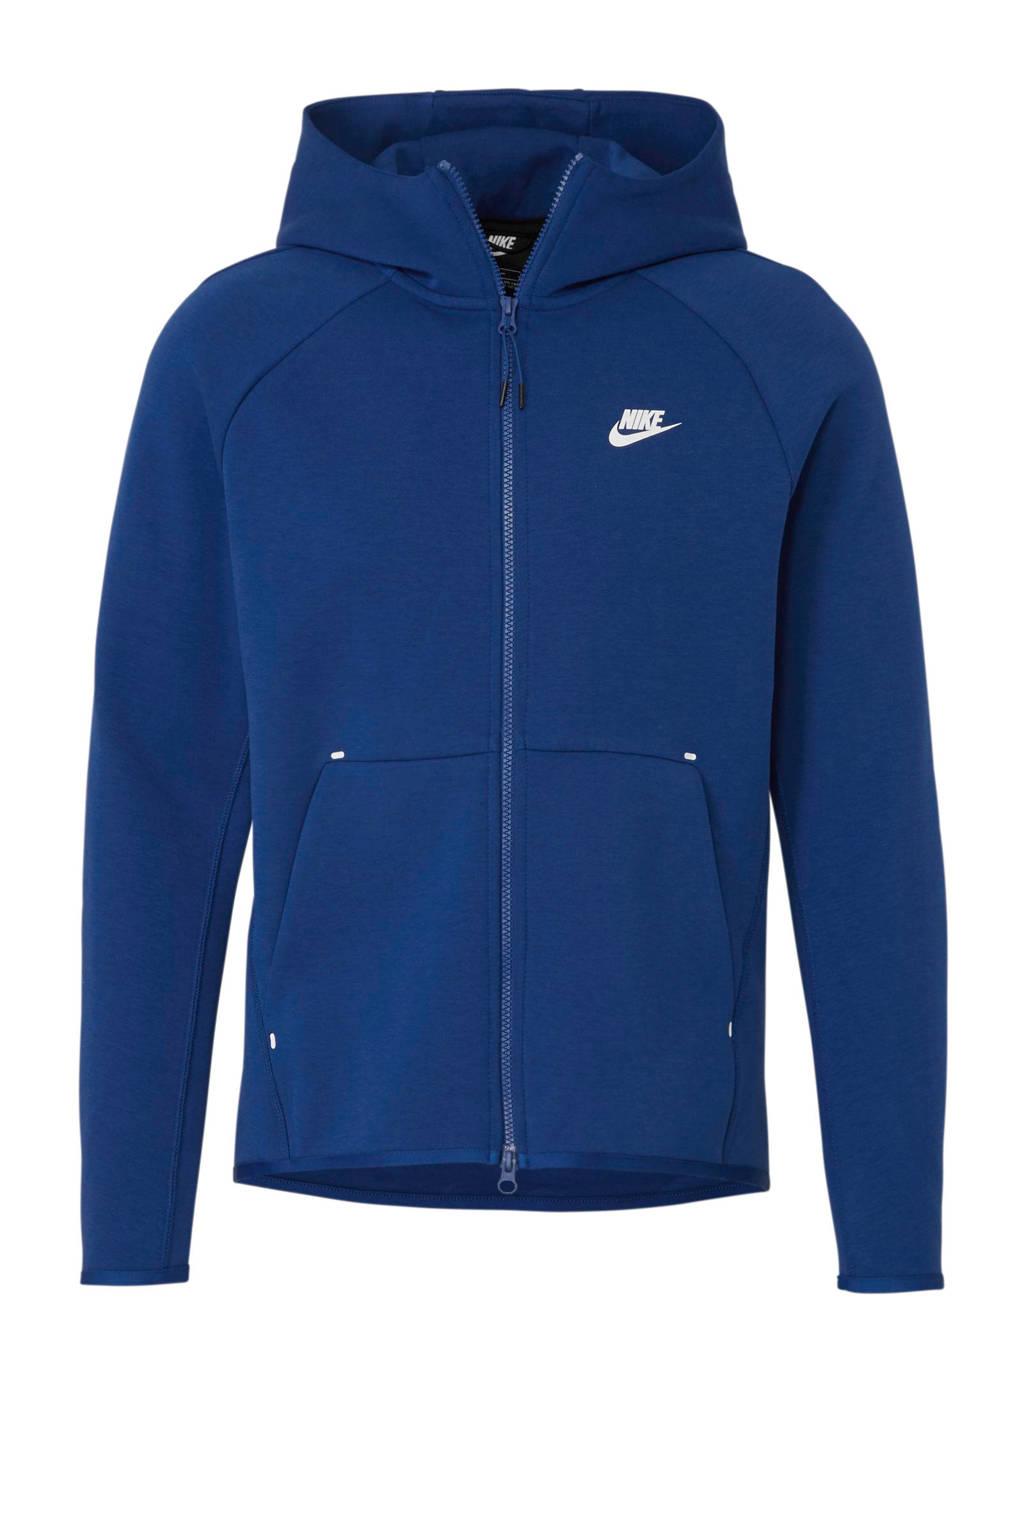 Nike   Tech Fleece vest blauw, Blauw